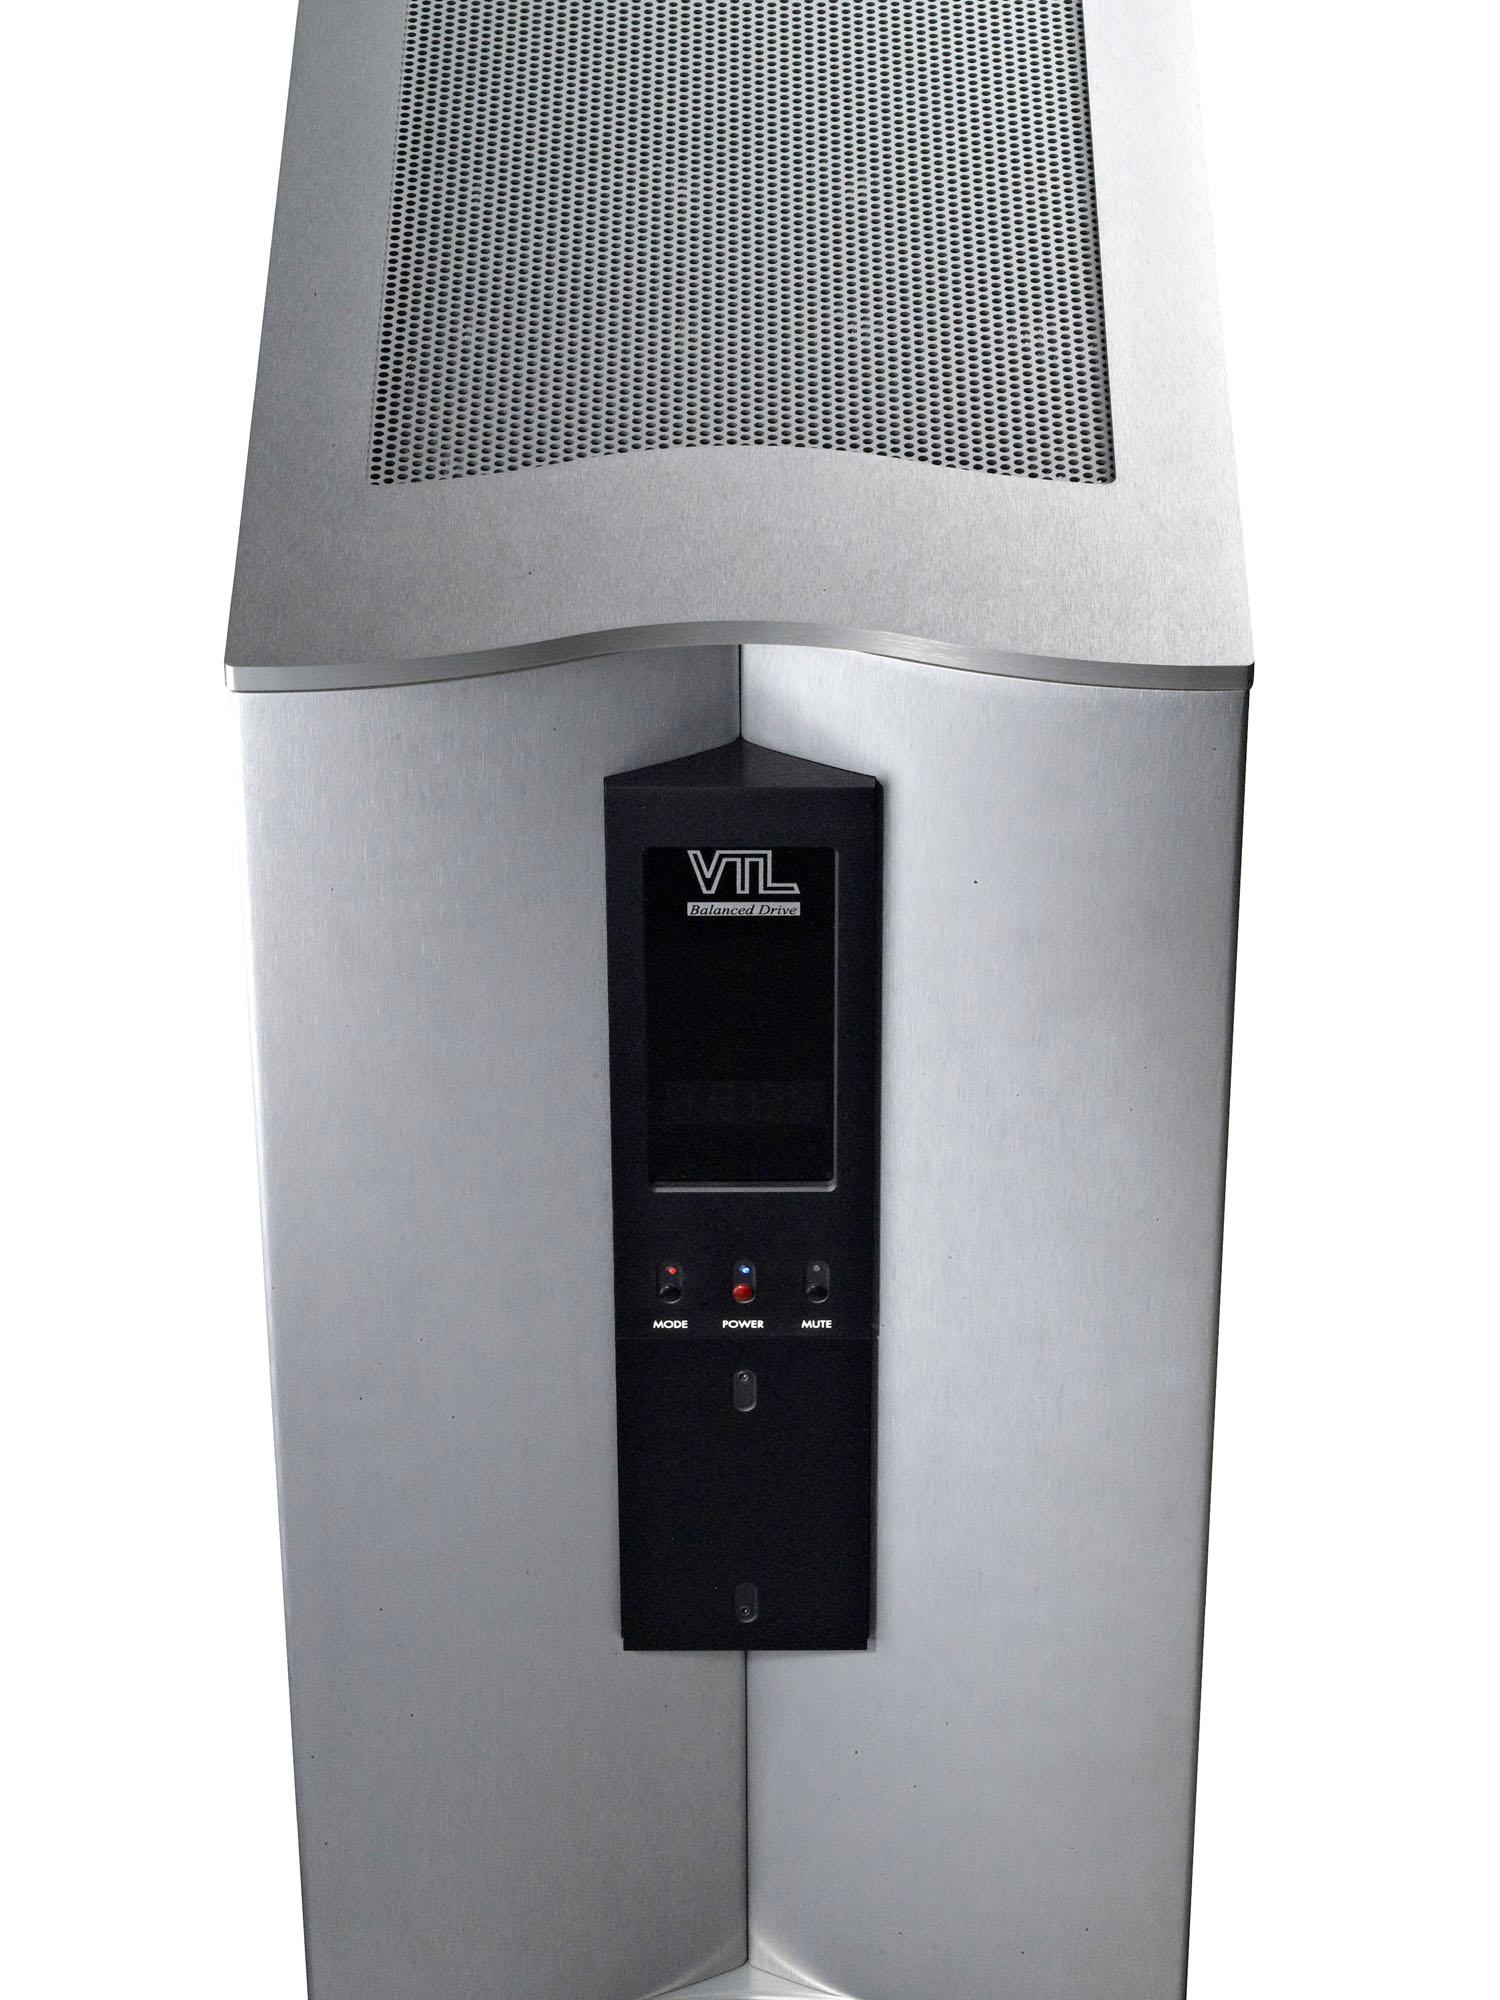 VTL S-400 Series II Stereo Power Amplifier